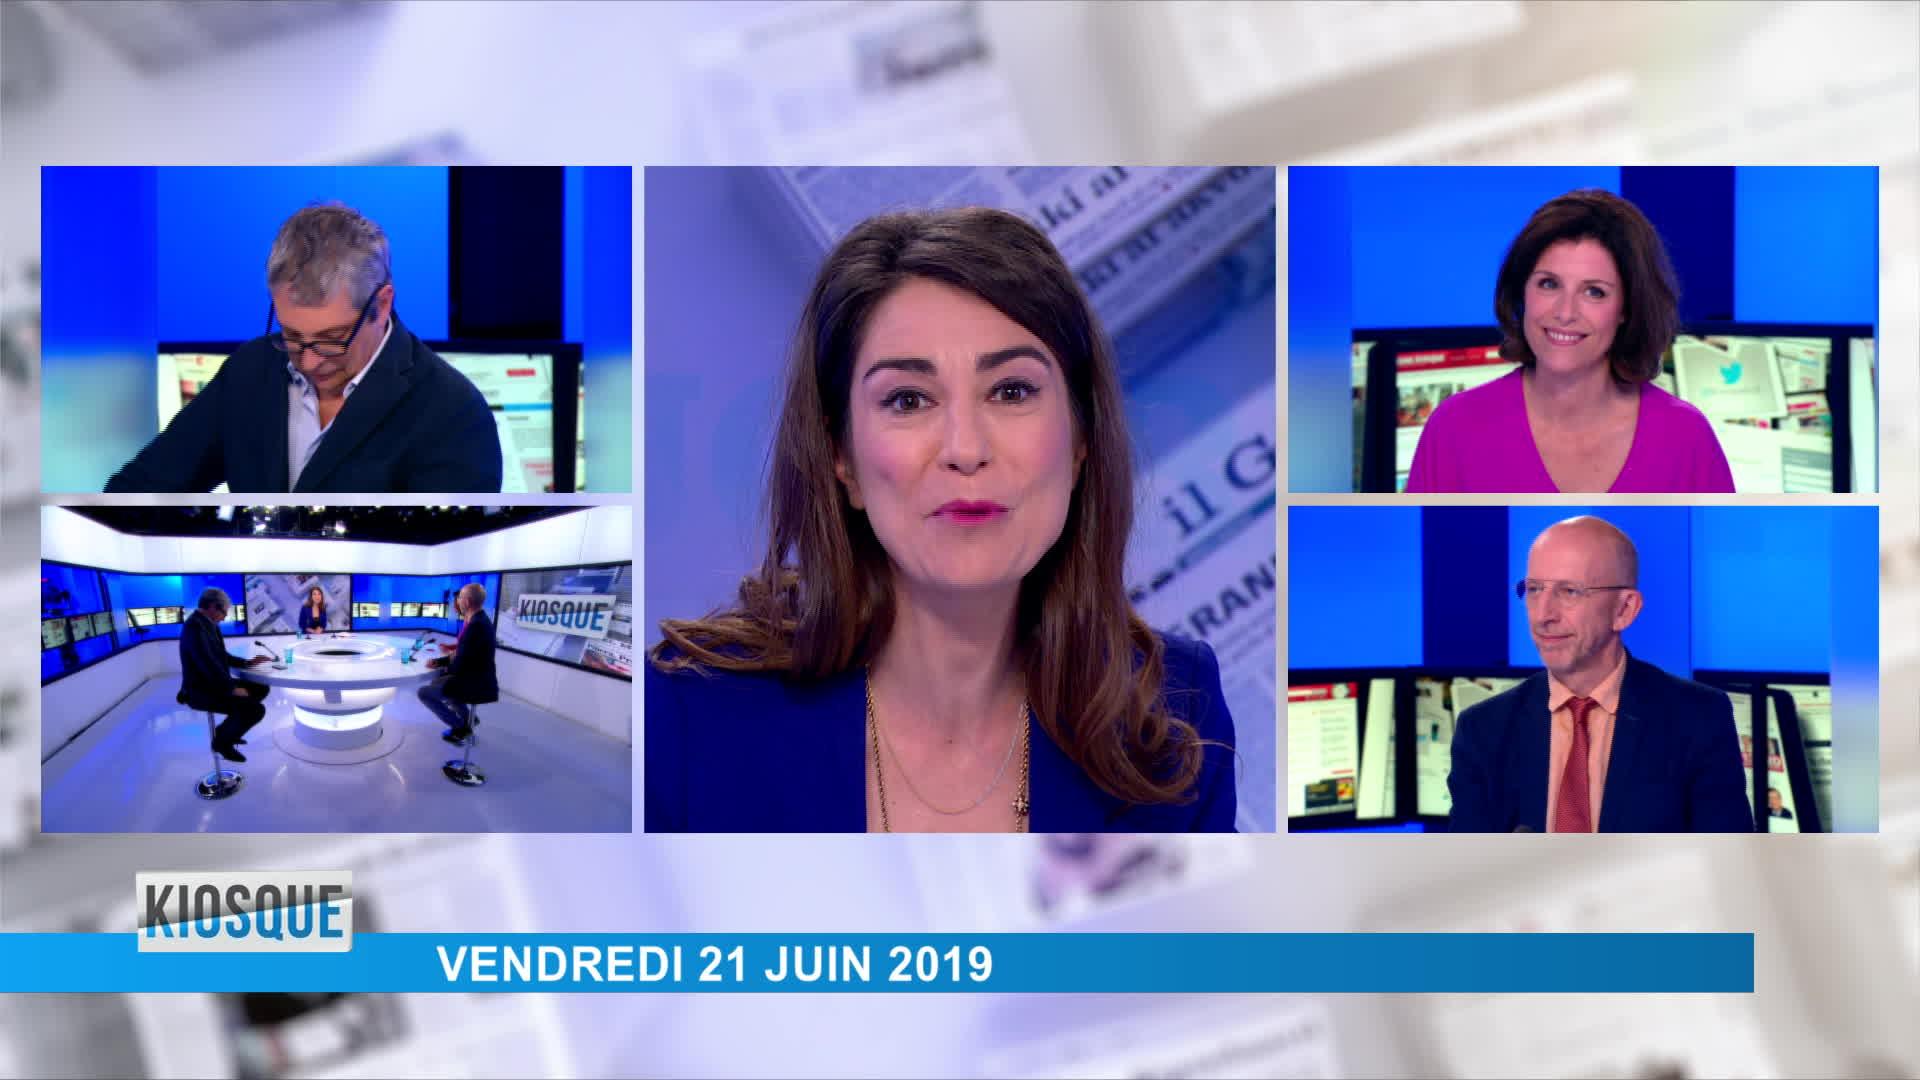 Sommet UE / Trump 2020 / Québec immigration / Libra Facebook